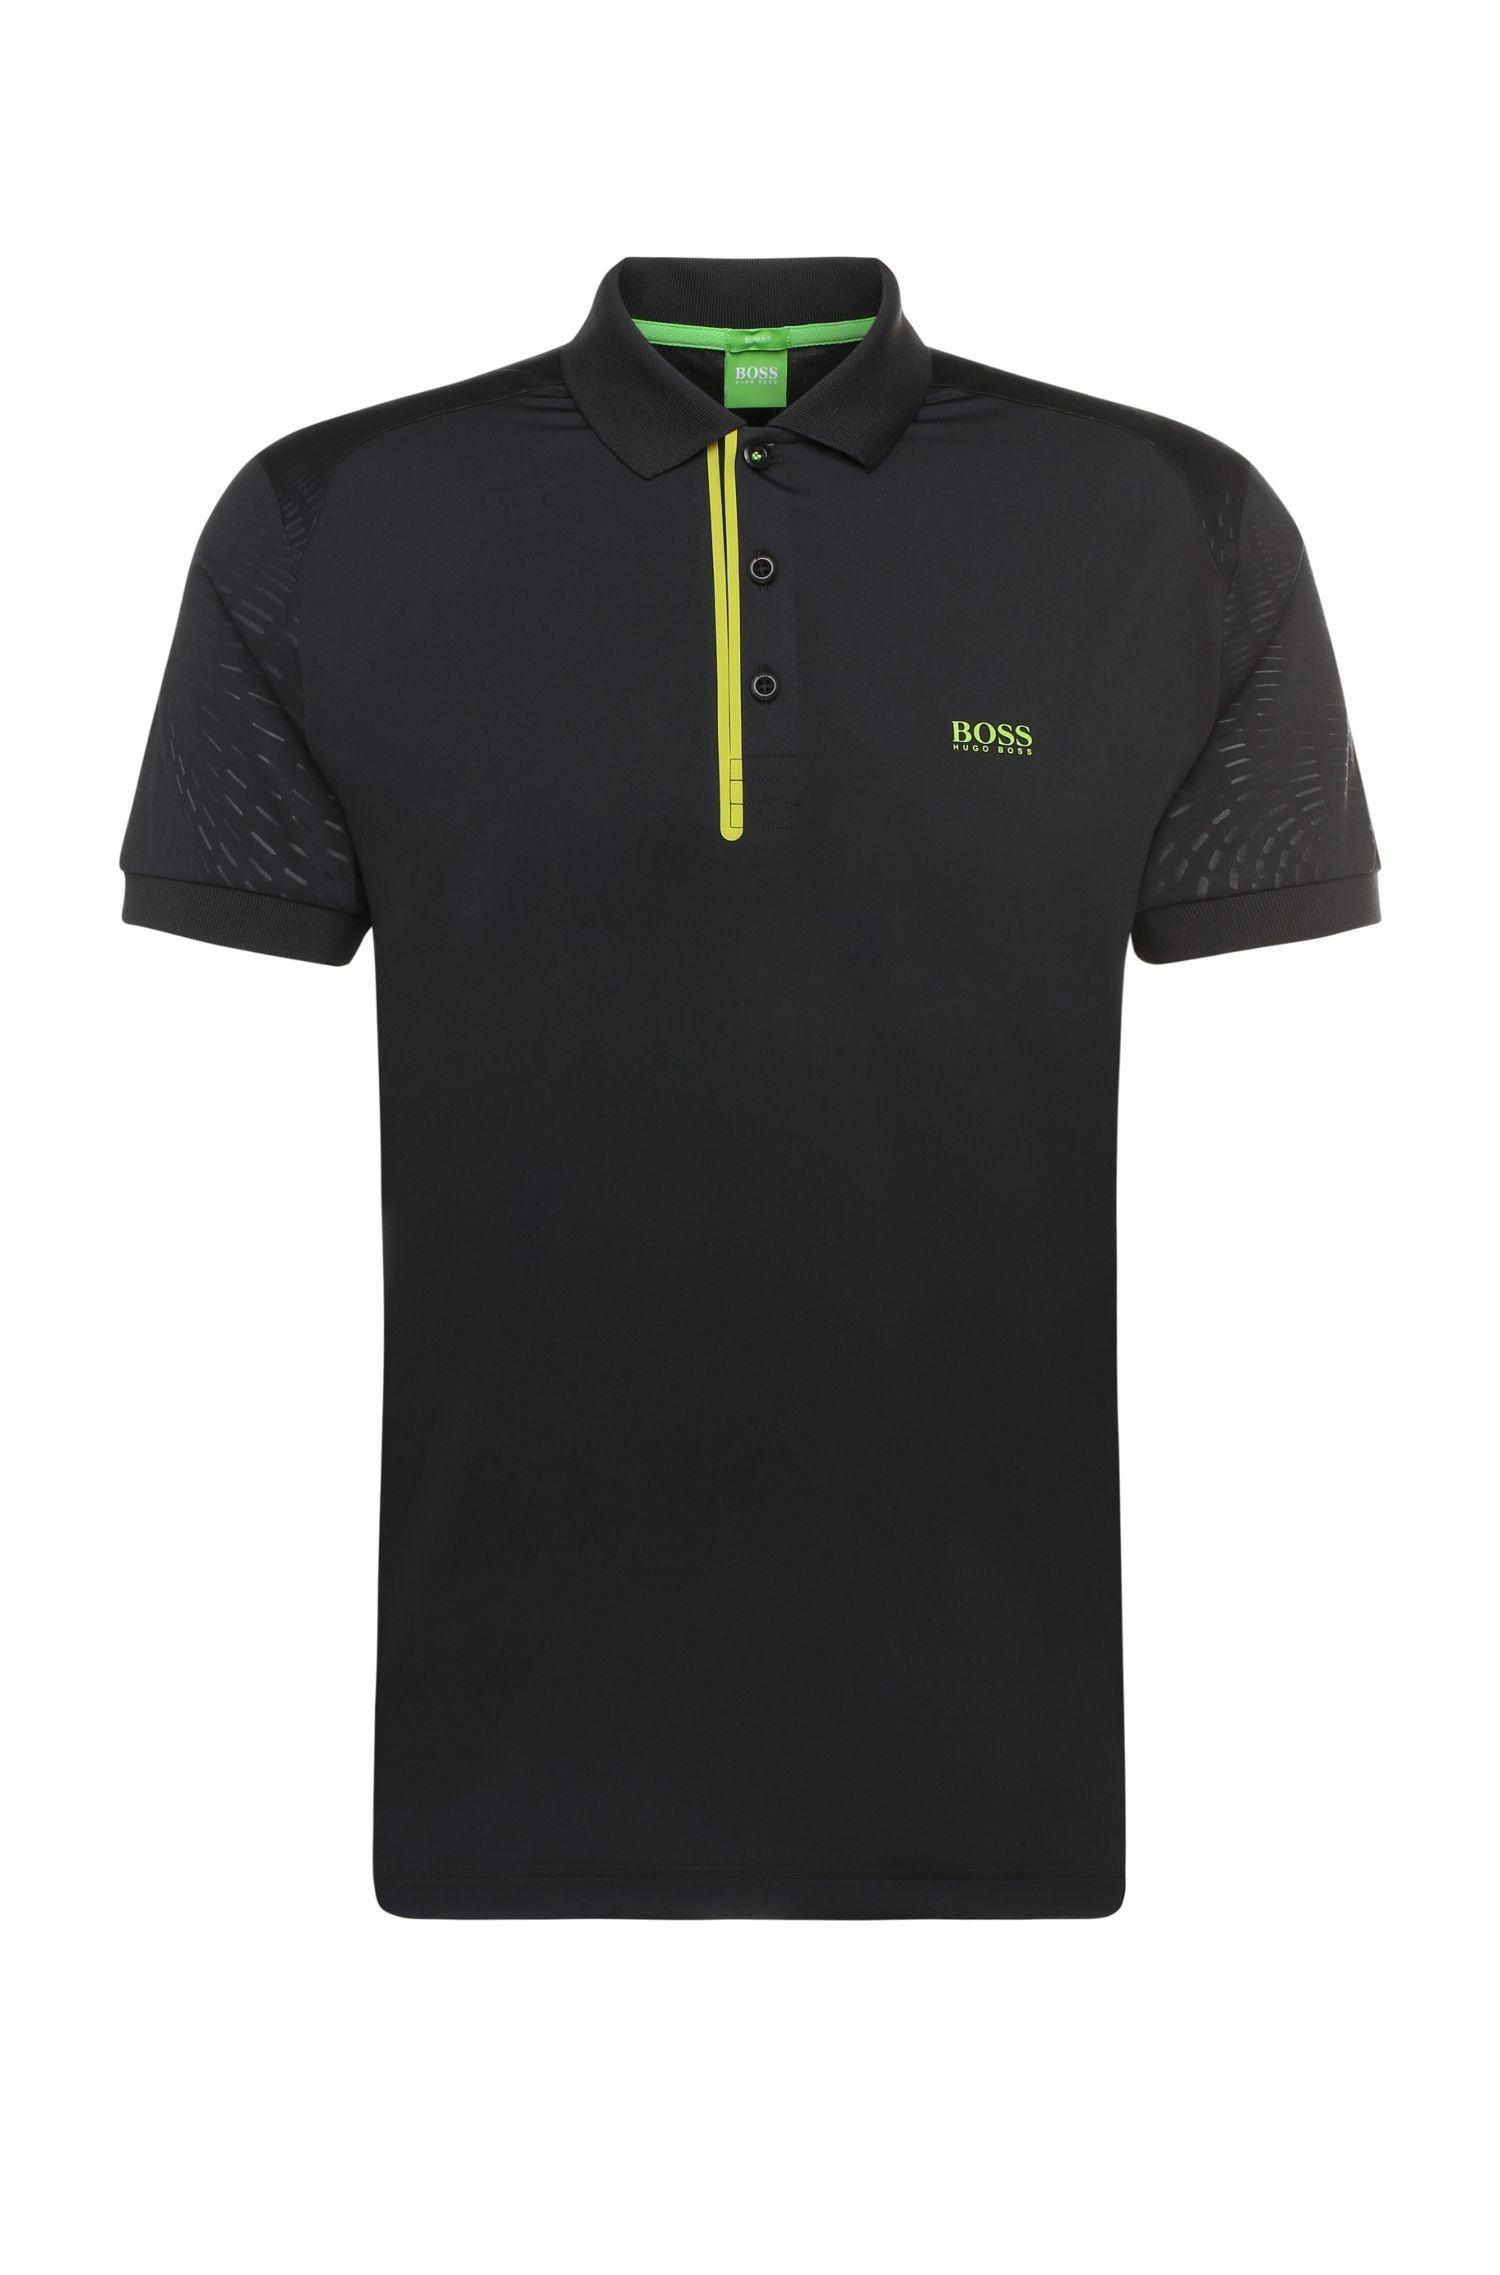 'Pavotech'   Slim Fit, Stretch Techno Jersey Polo Shirt